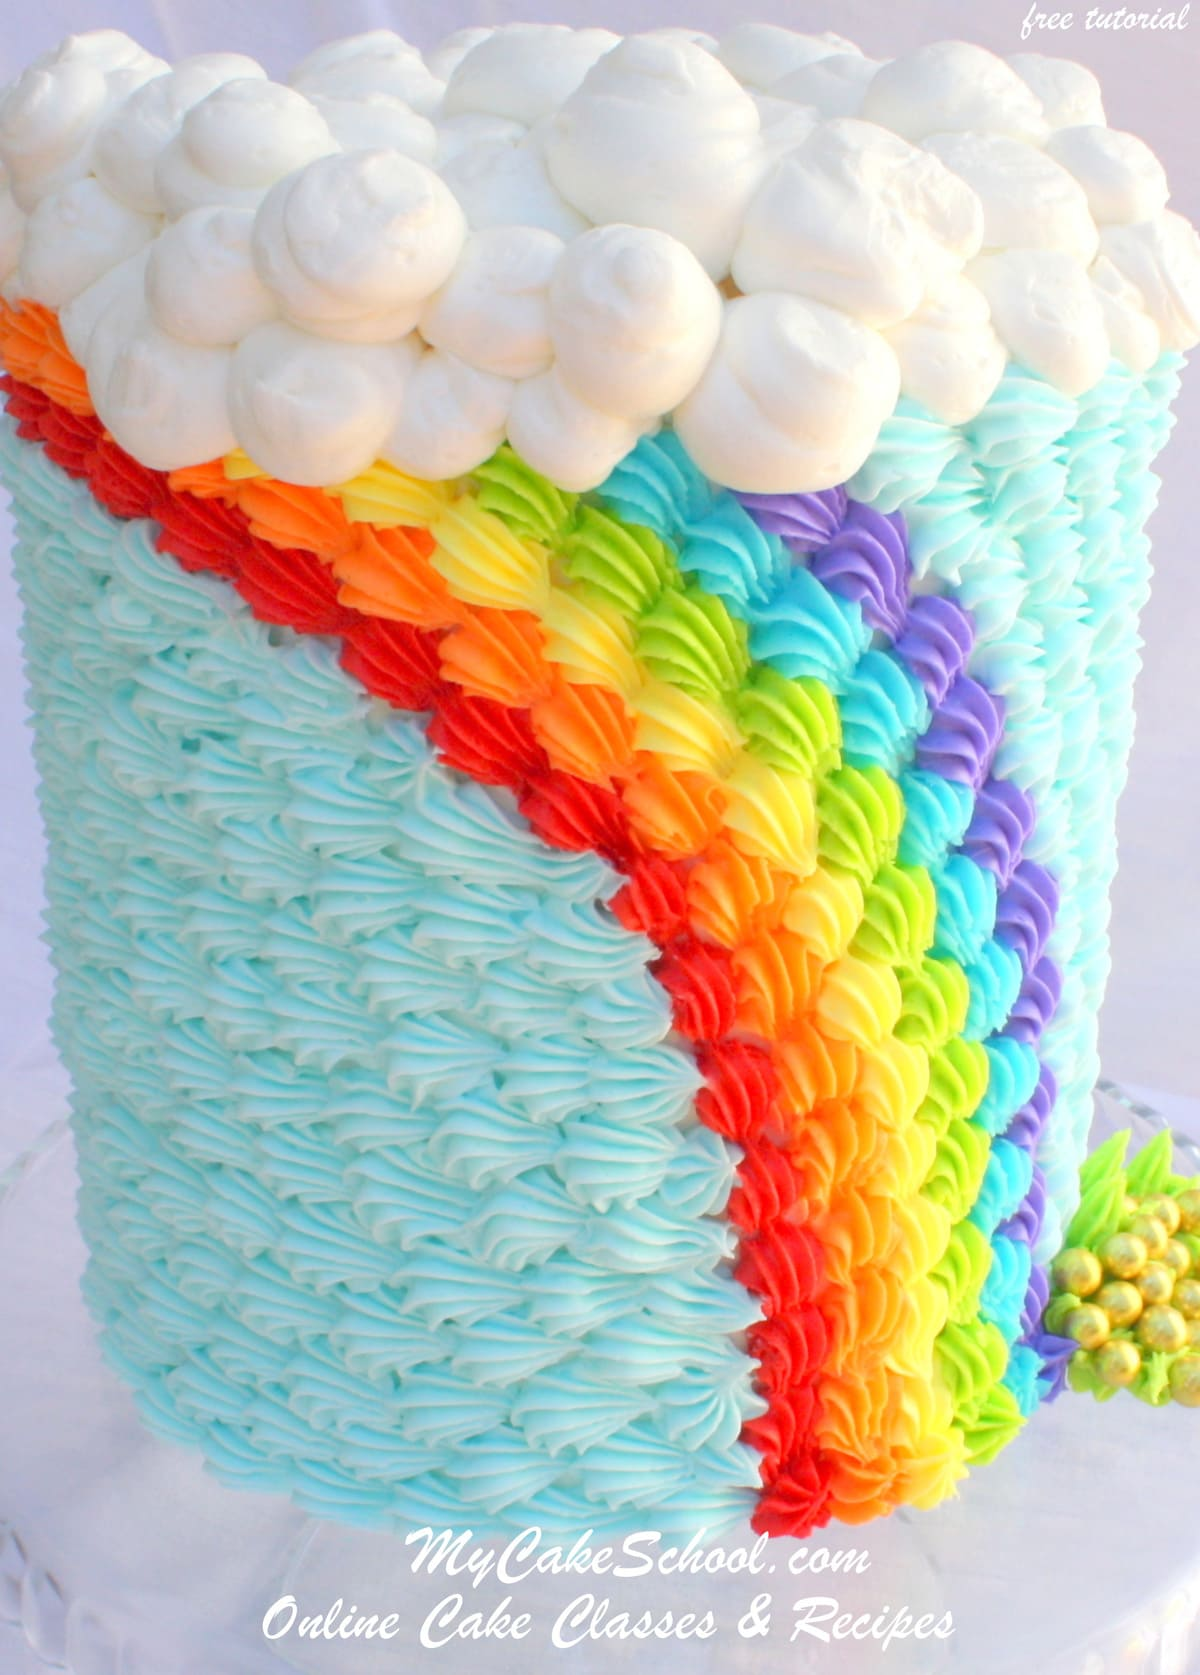 Saint Patrick's Day~ Buttercream Rainbow!~Blog Tutorial ...